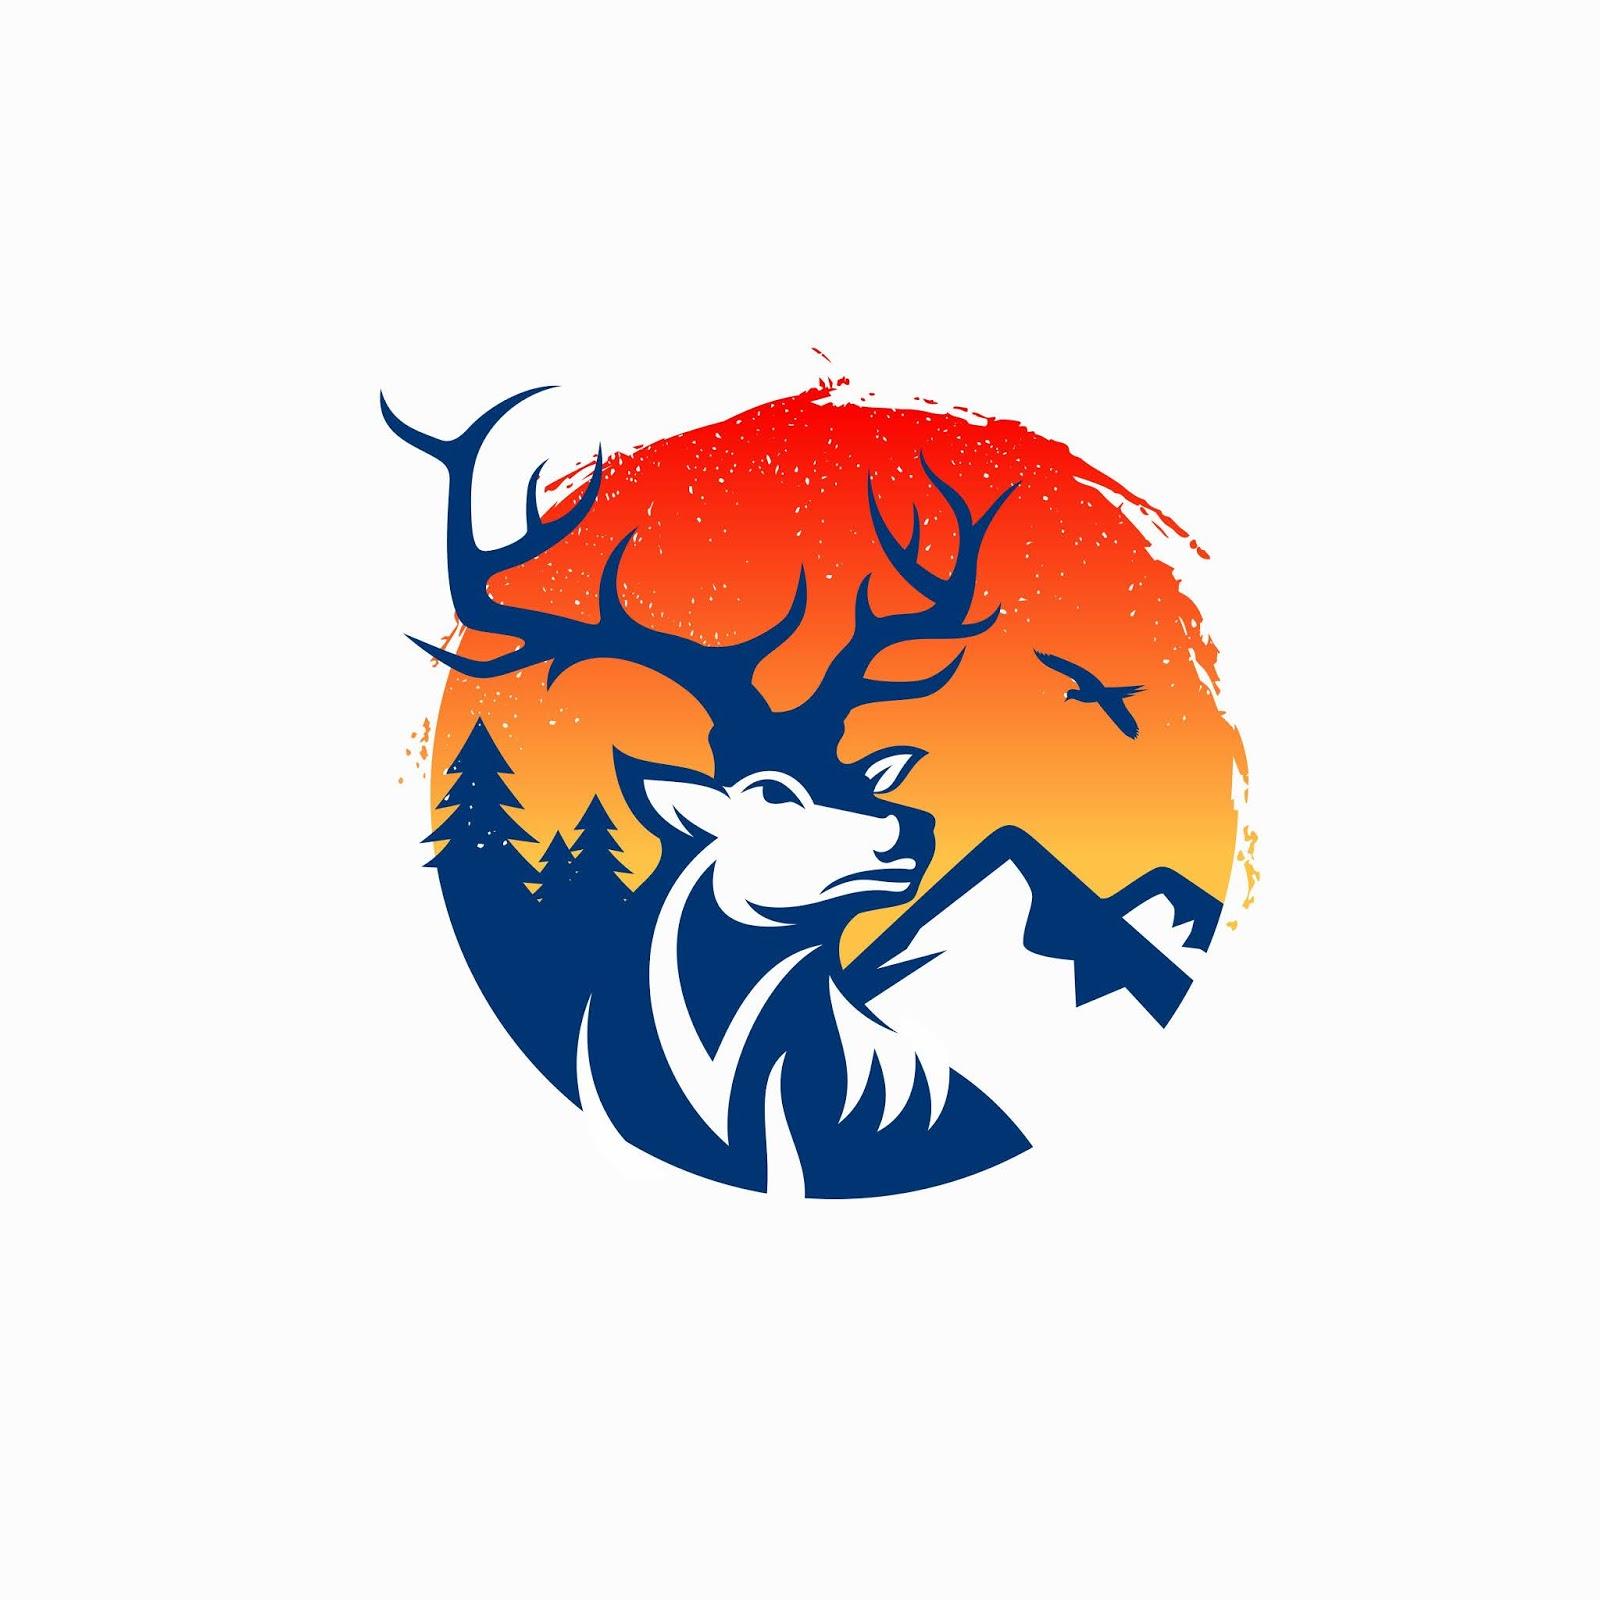 Vintage Deer Logo Free Download Vector CDR, AI, EPS and PNG Formats